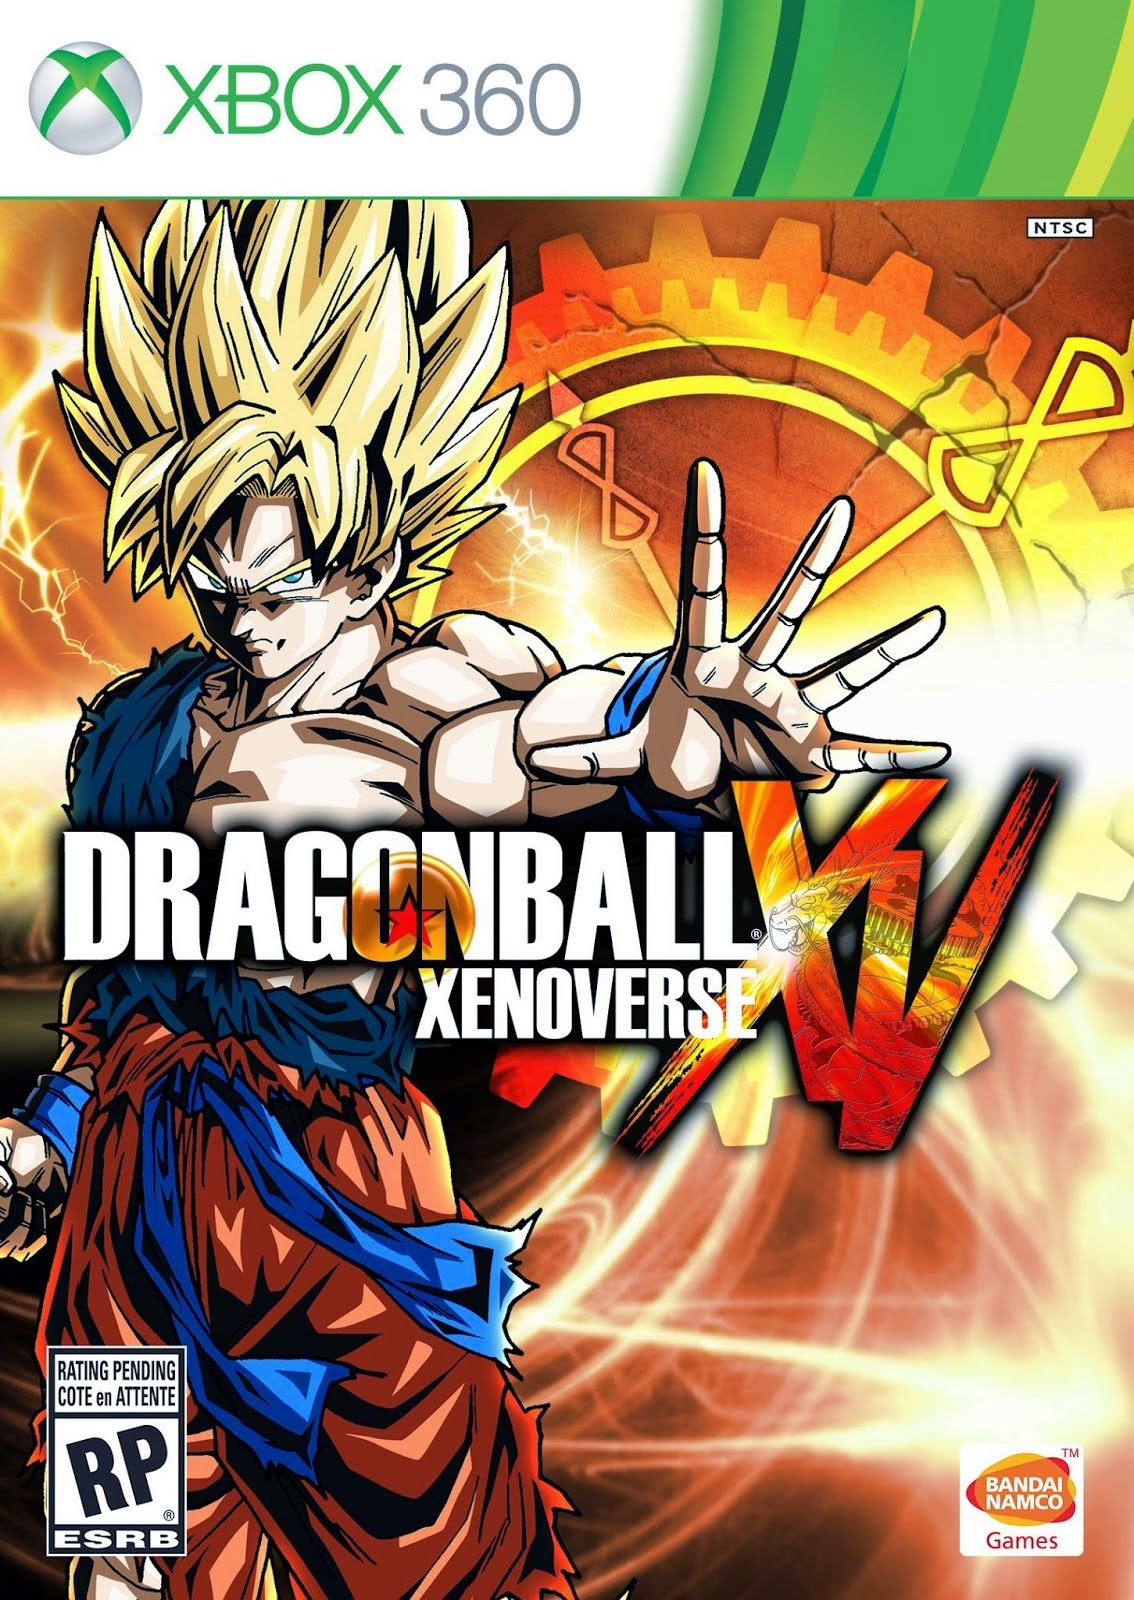 Dragon Ball Xenoverse XBOX360 PS3 free download full version